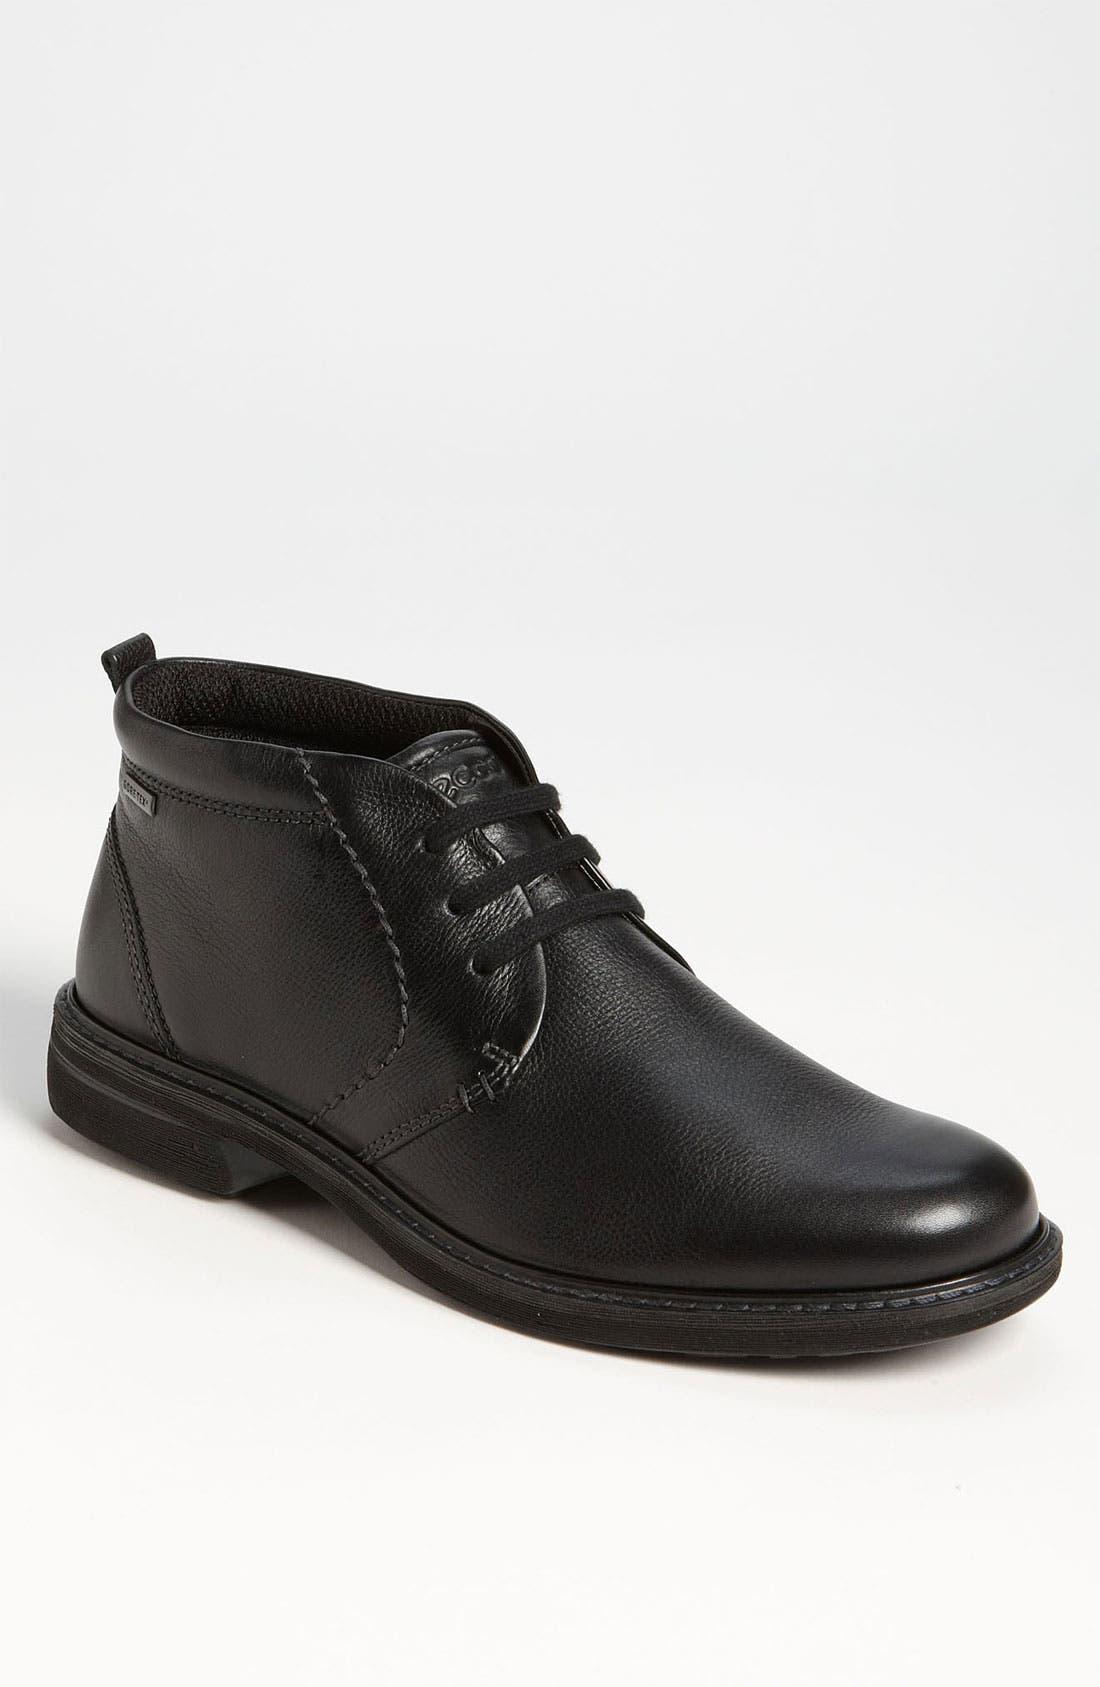 Main Image - ECCO 'Turn' Chukka Boot (Men)